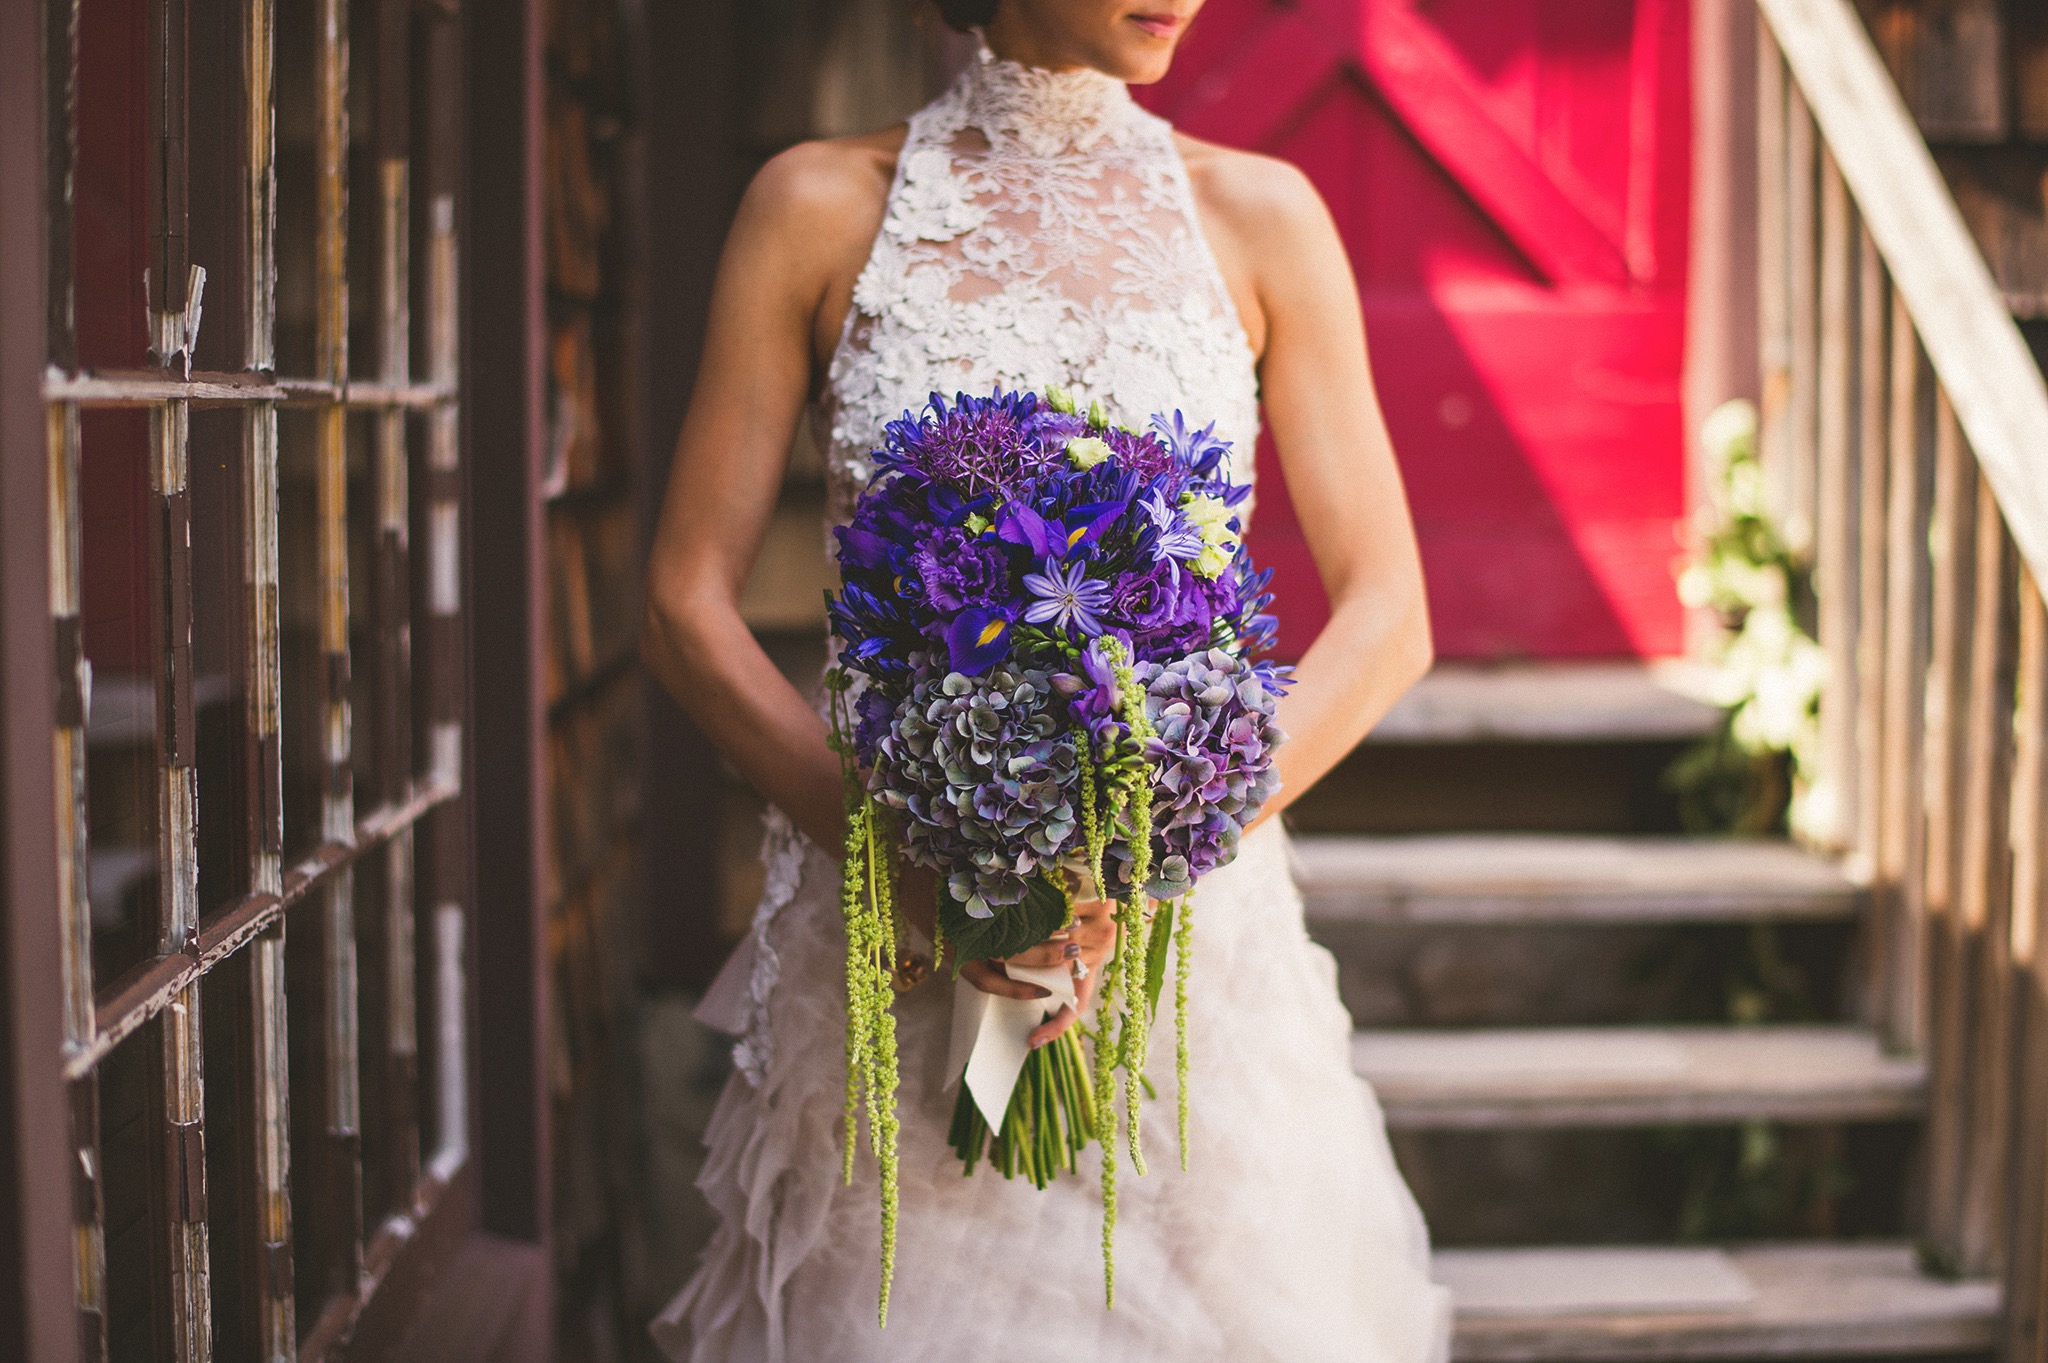 33-bride-holding-rustic-bouquet.jpg